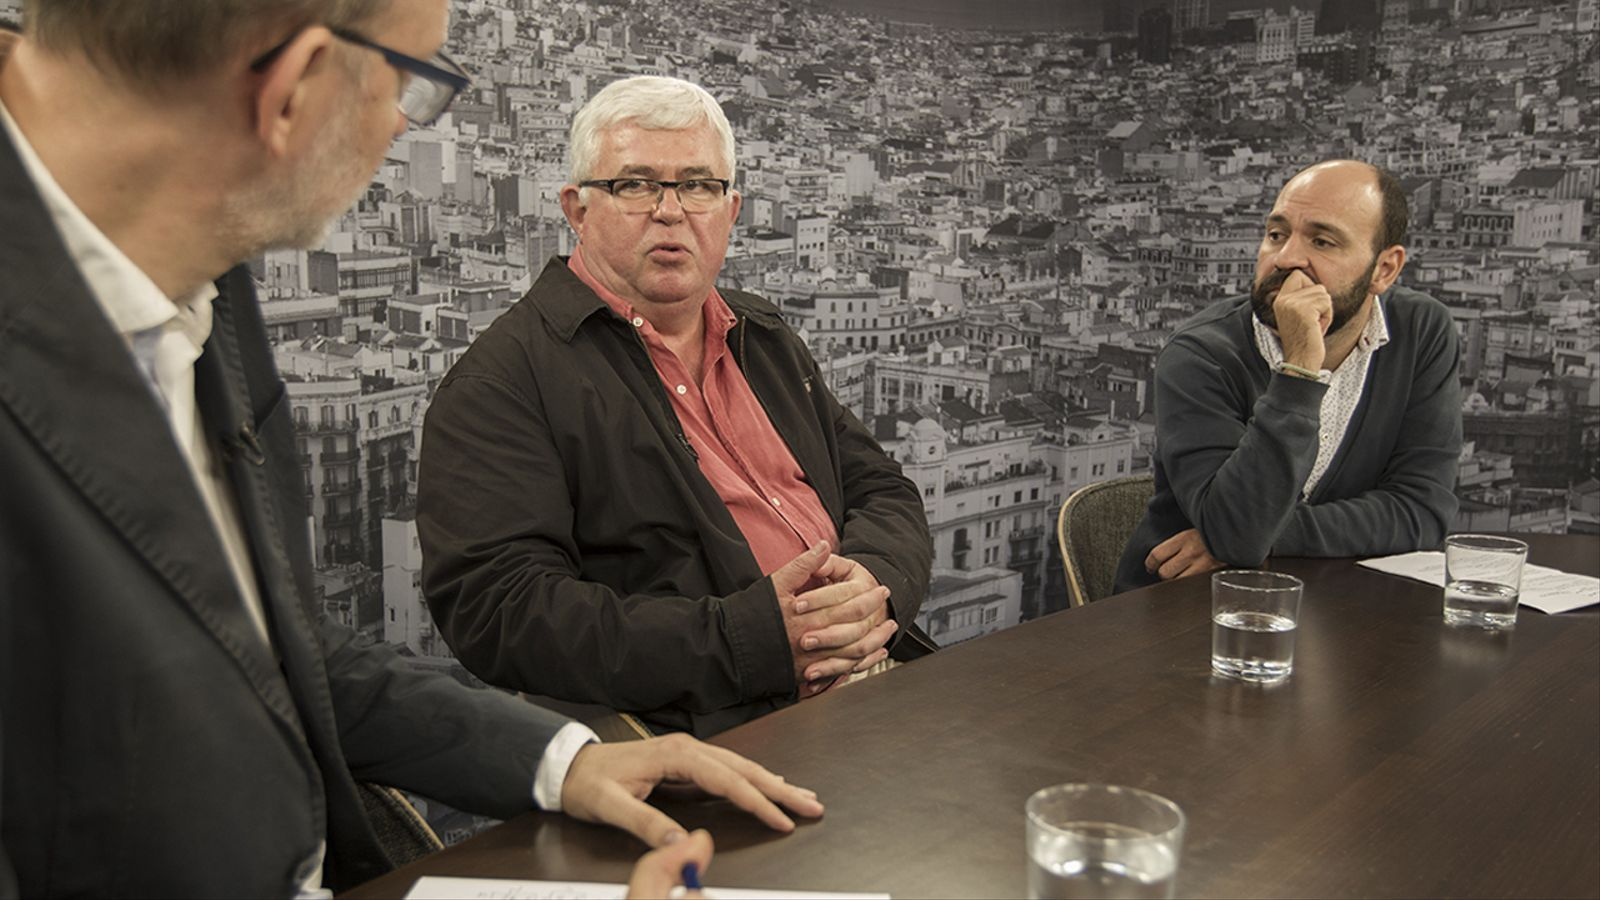 Entrevista d'Antoni Bassas a Agustí Alcoberro (ANC) i Marcel Mauri (Òmnium)